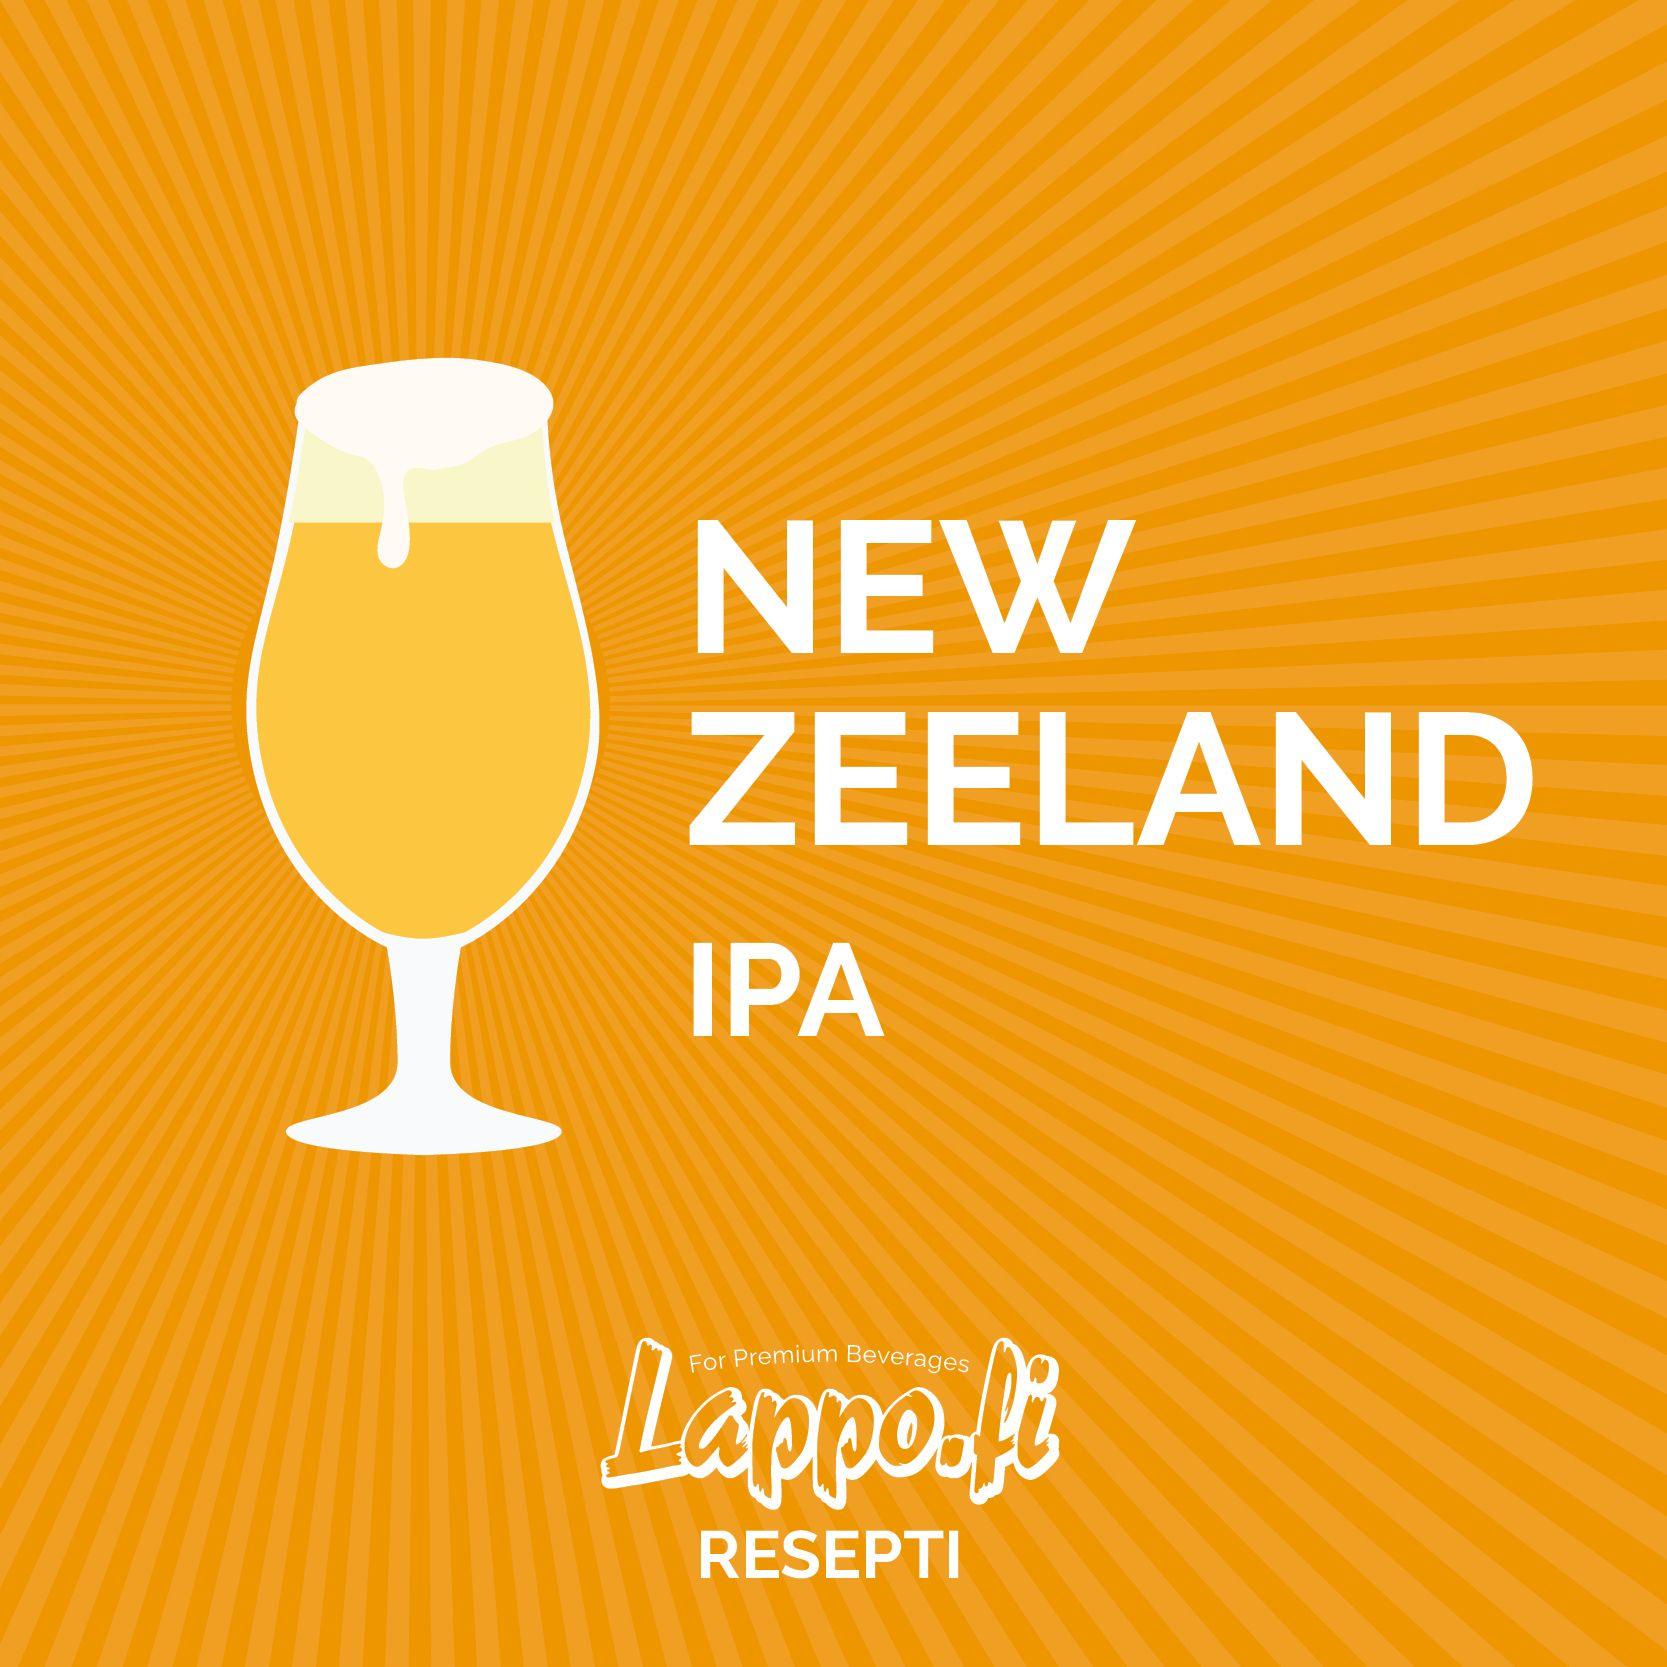 New Zeeland IPA